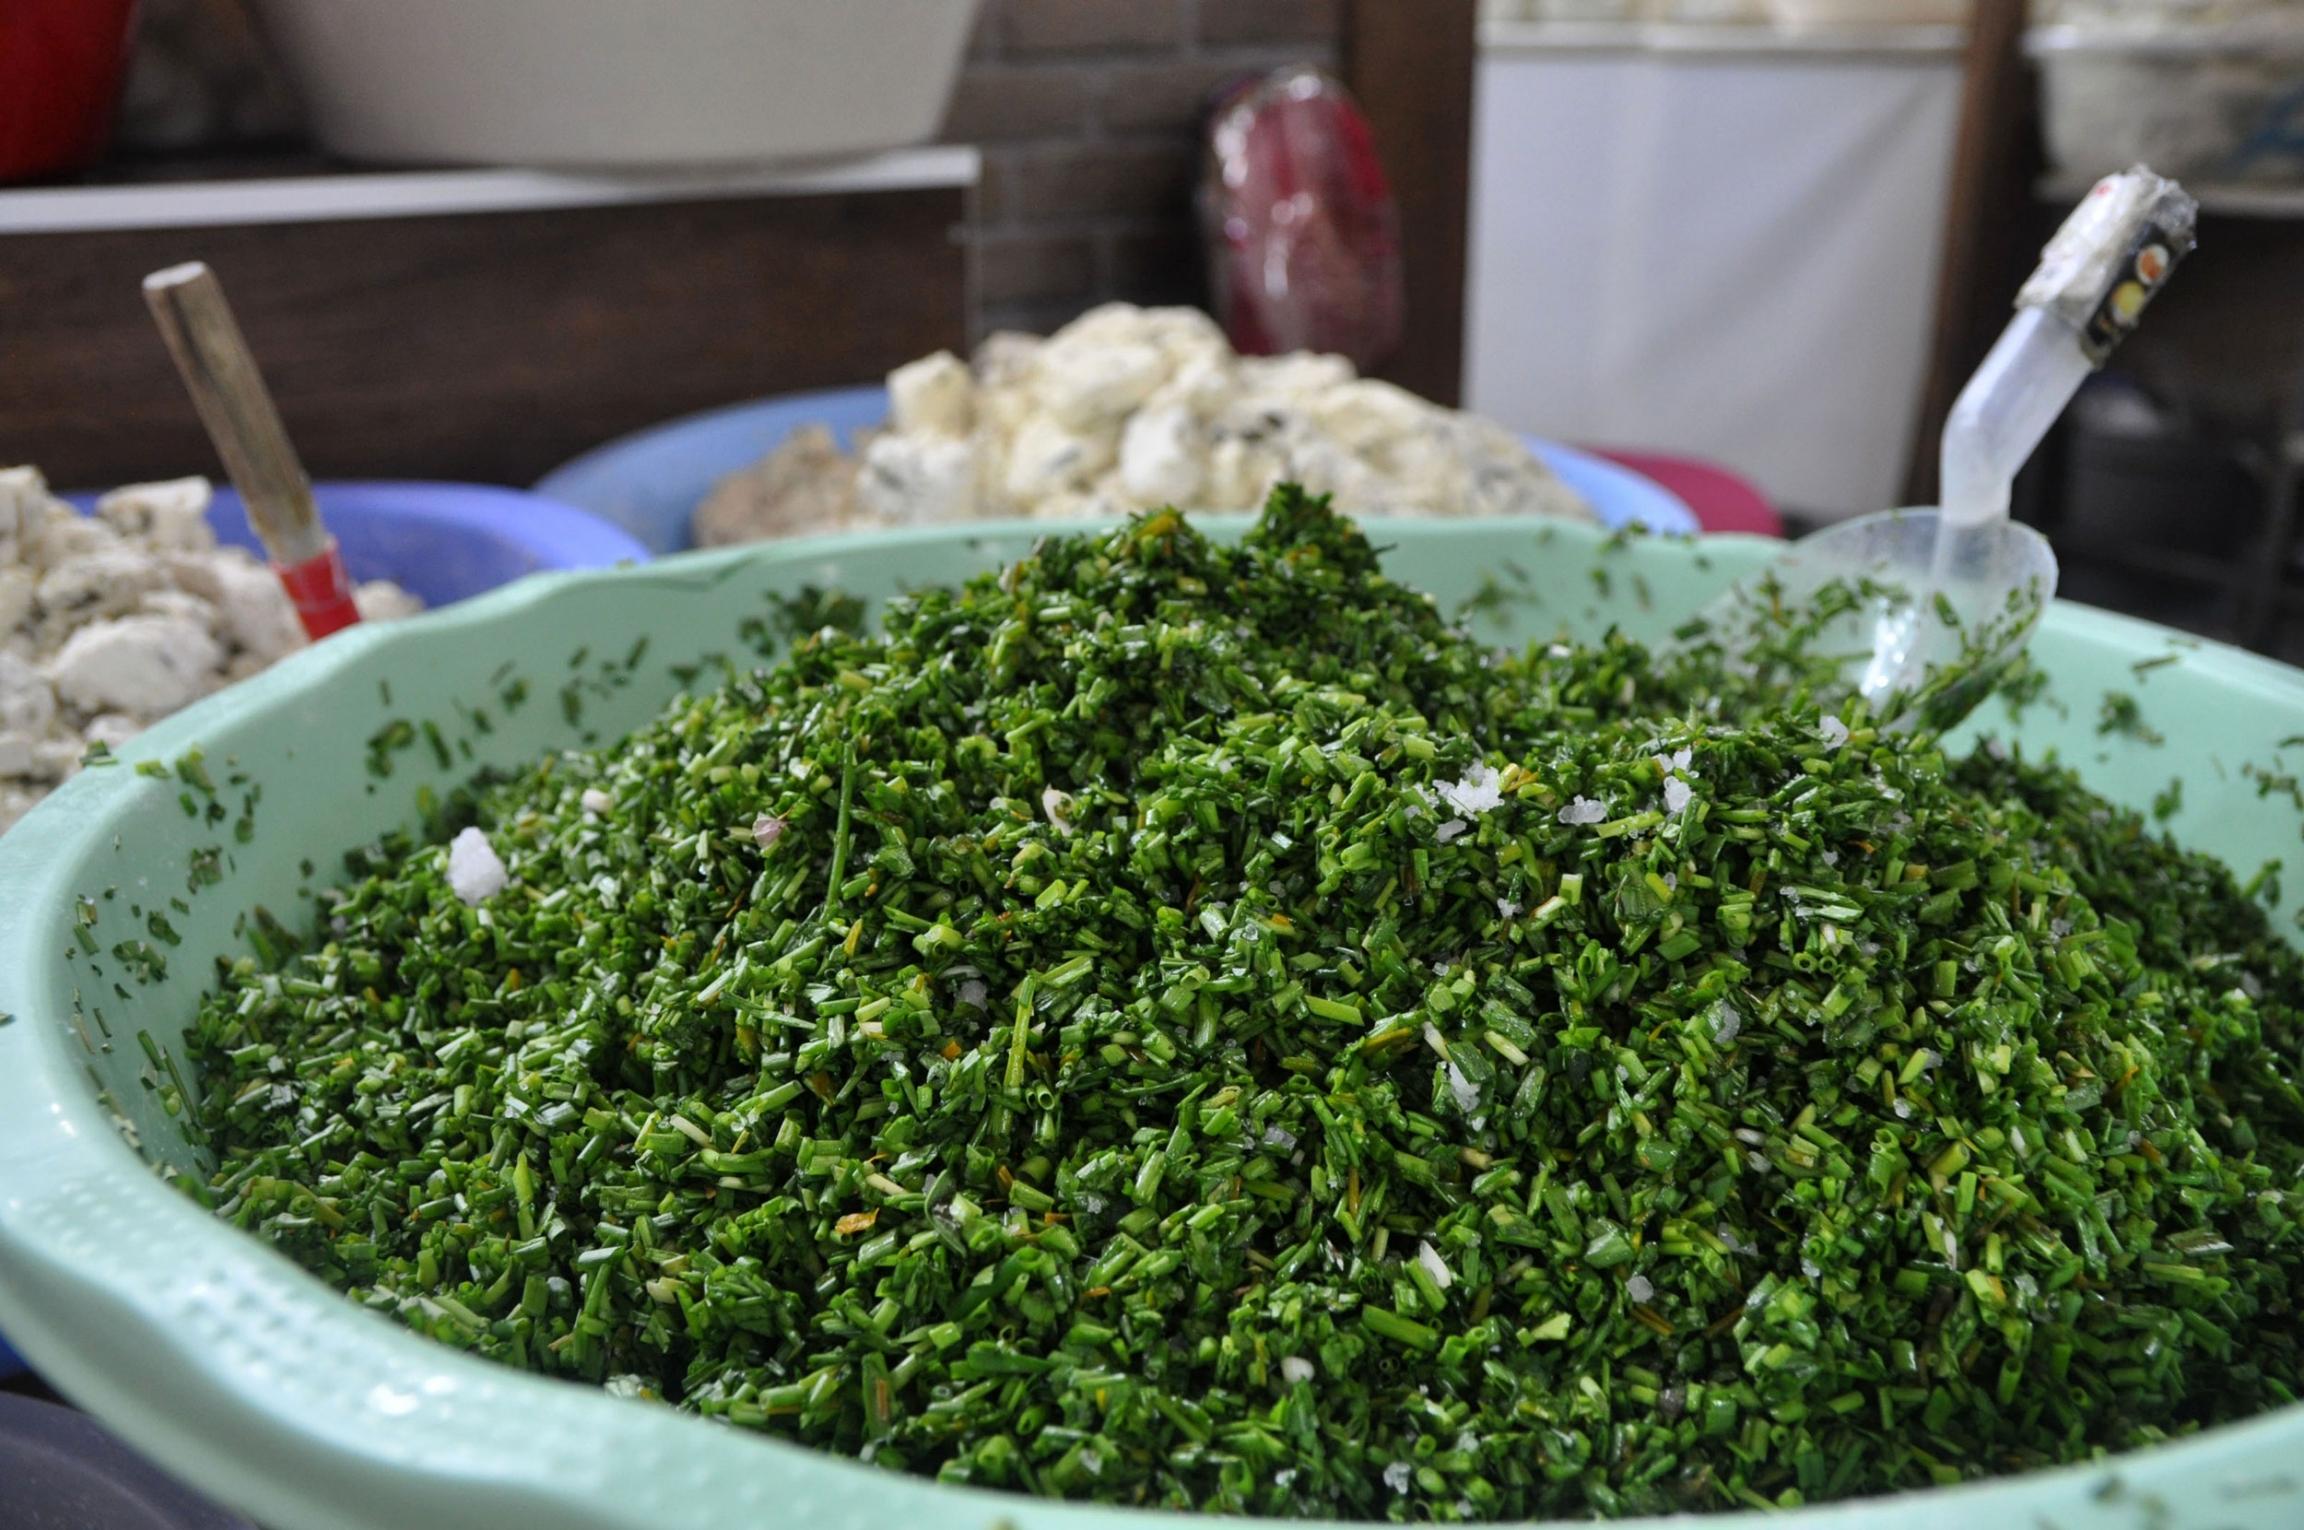 Green herbs used in Van Otlu Peyniri mixed in a green bowl.